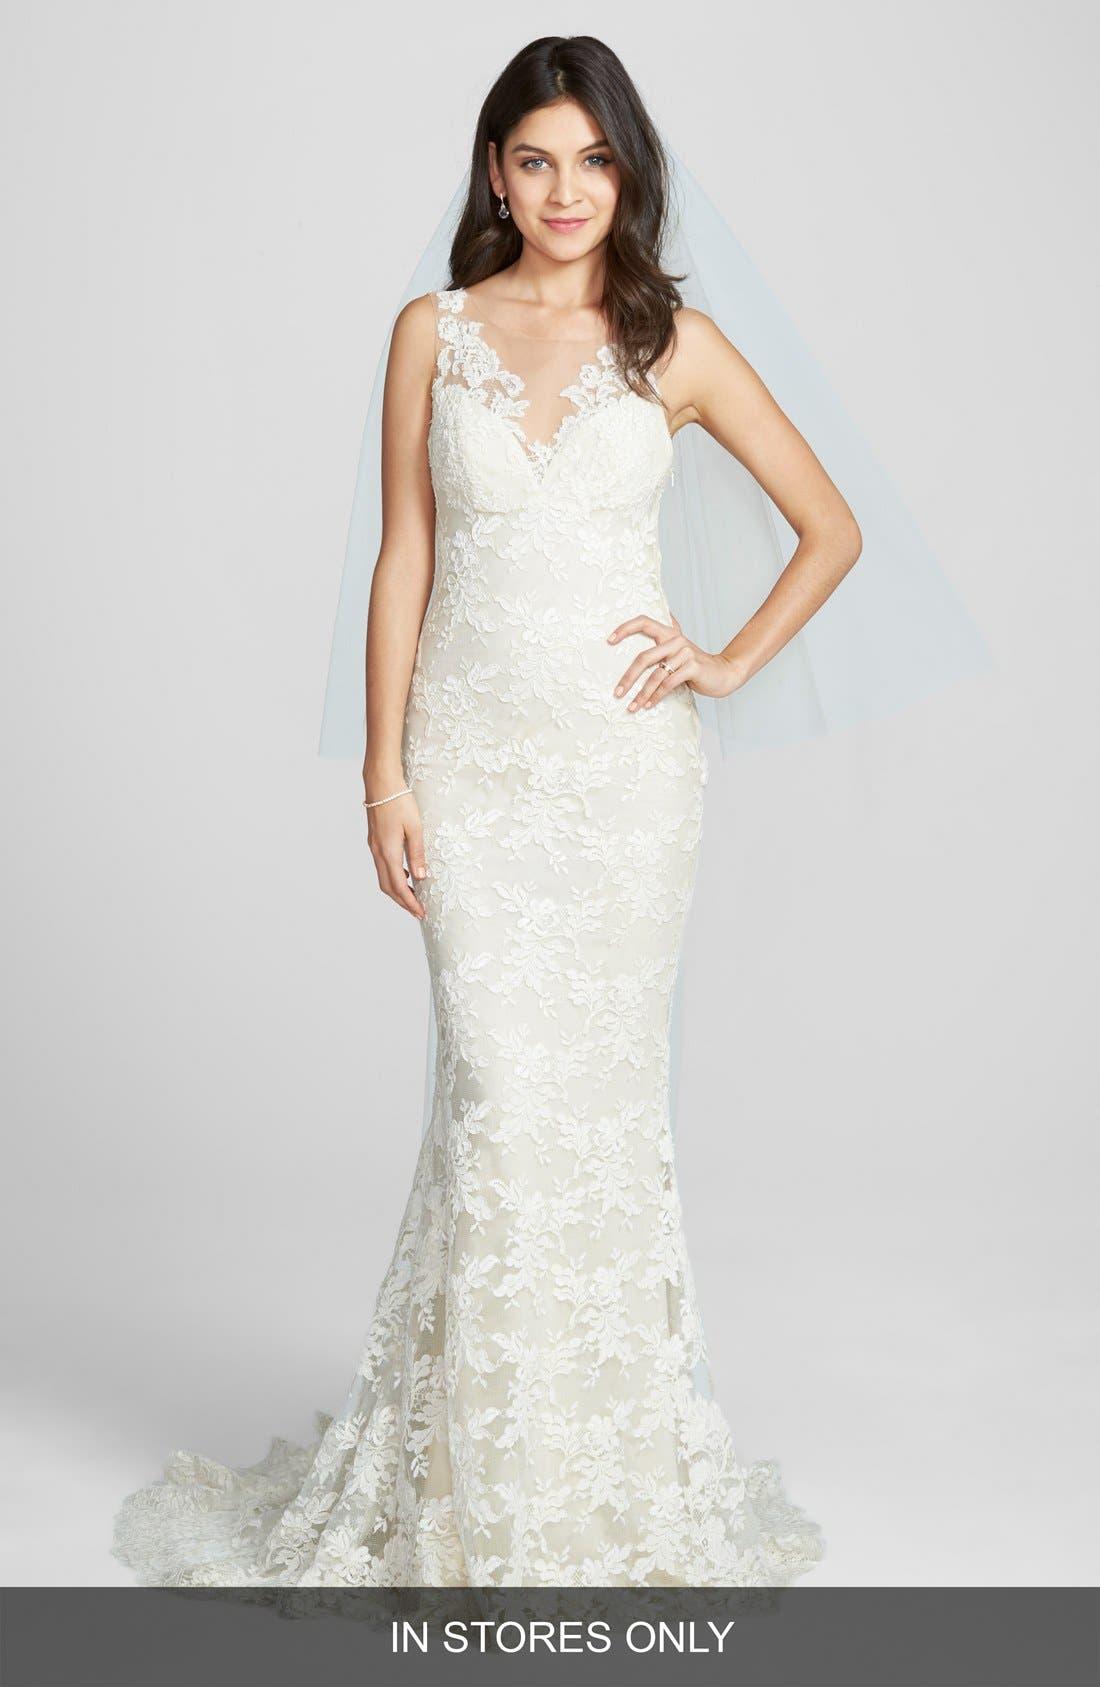 AMSALE 'Nicole' Alecon Lace Mermaid Dress in Ivory/ Vanilla